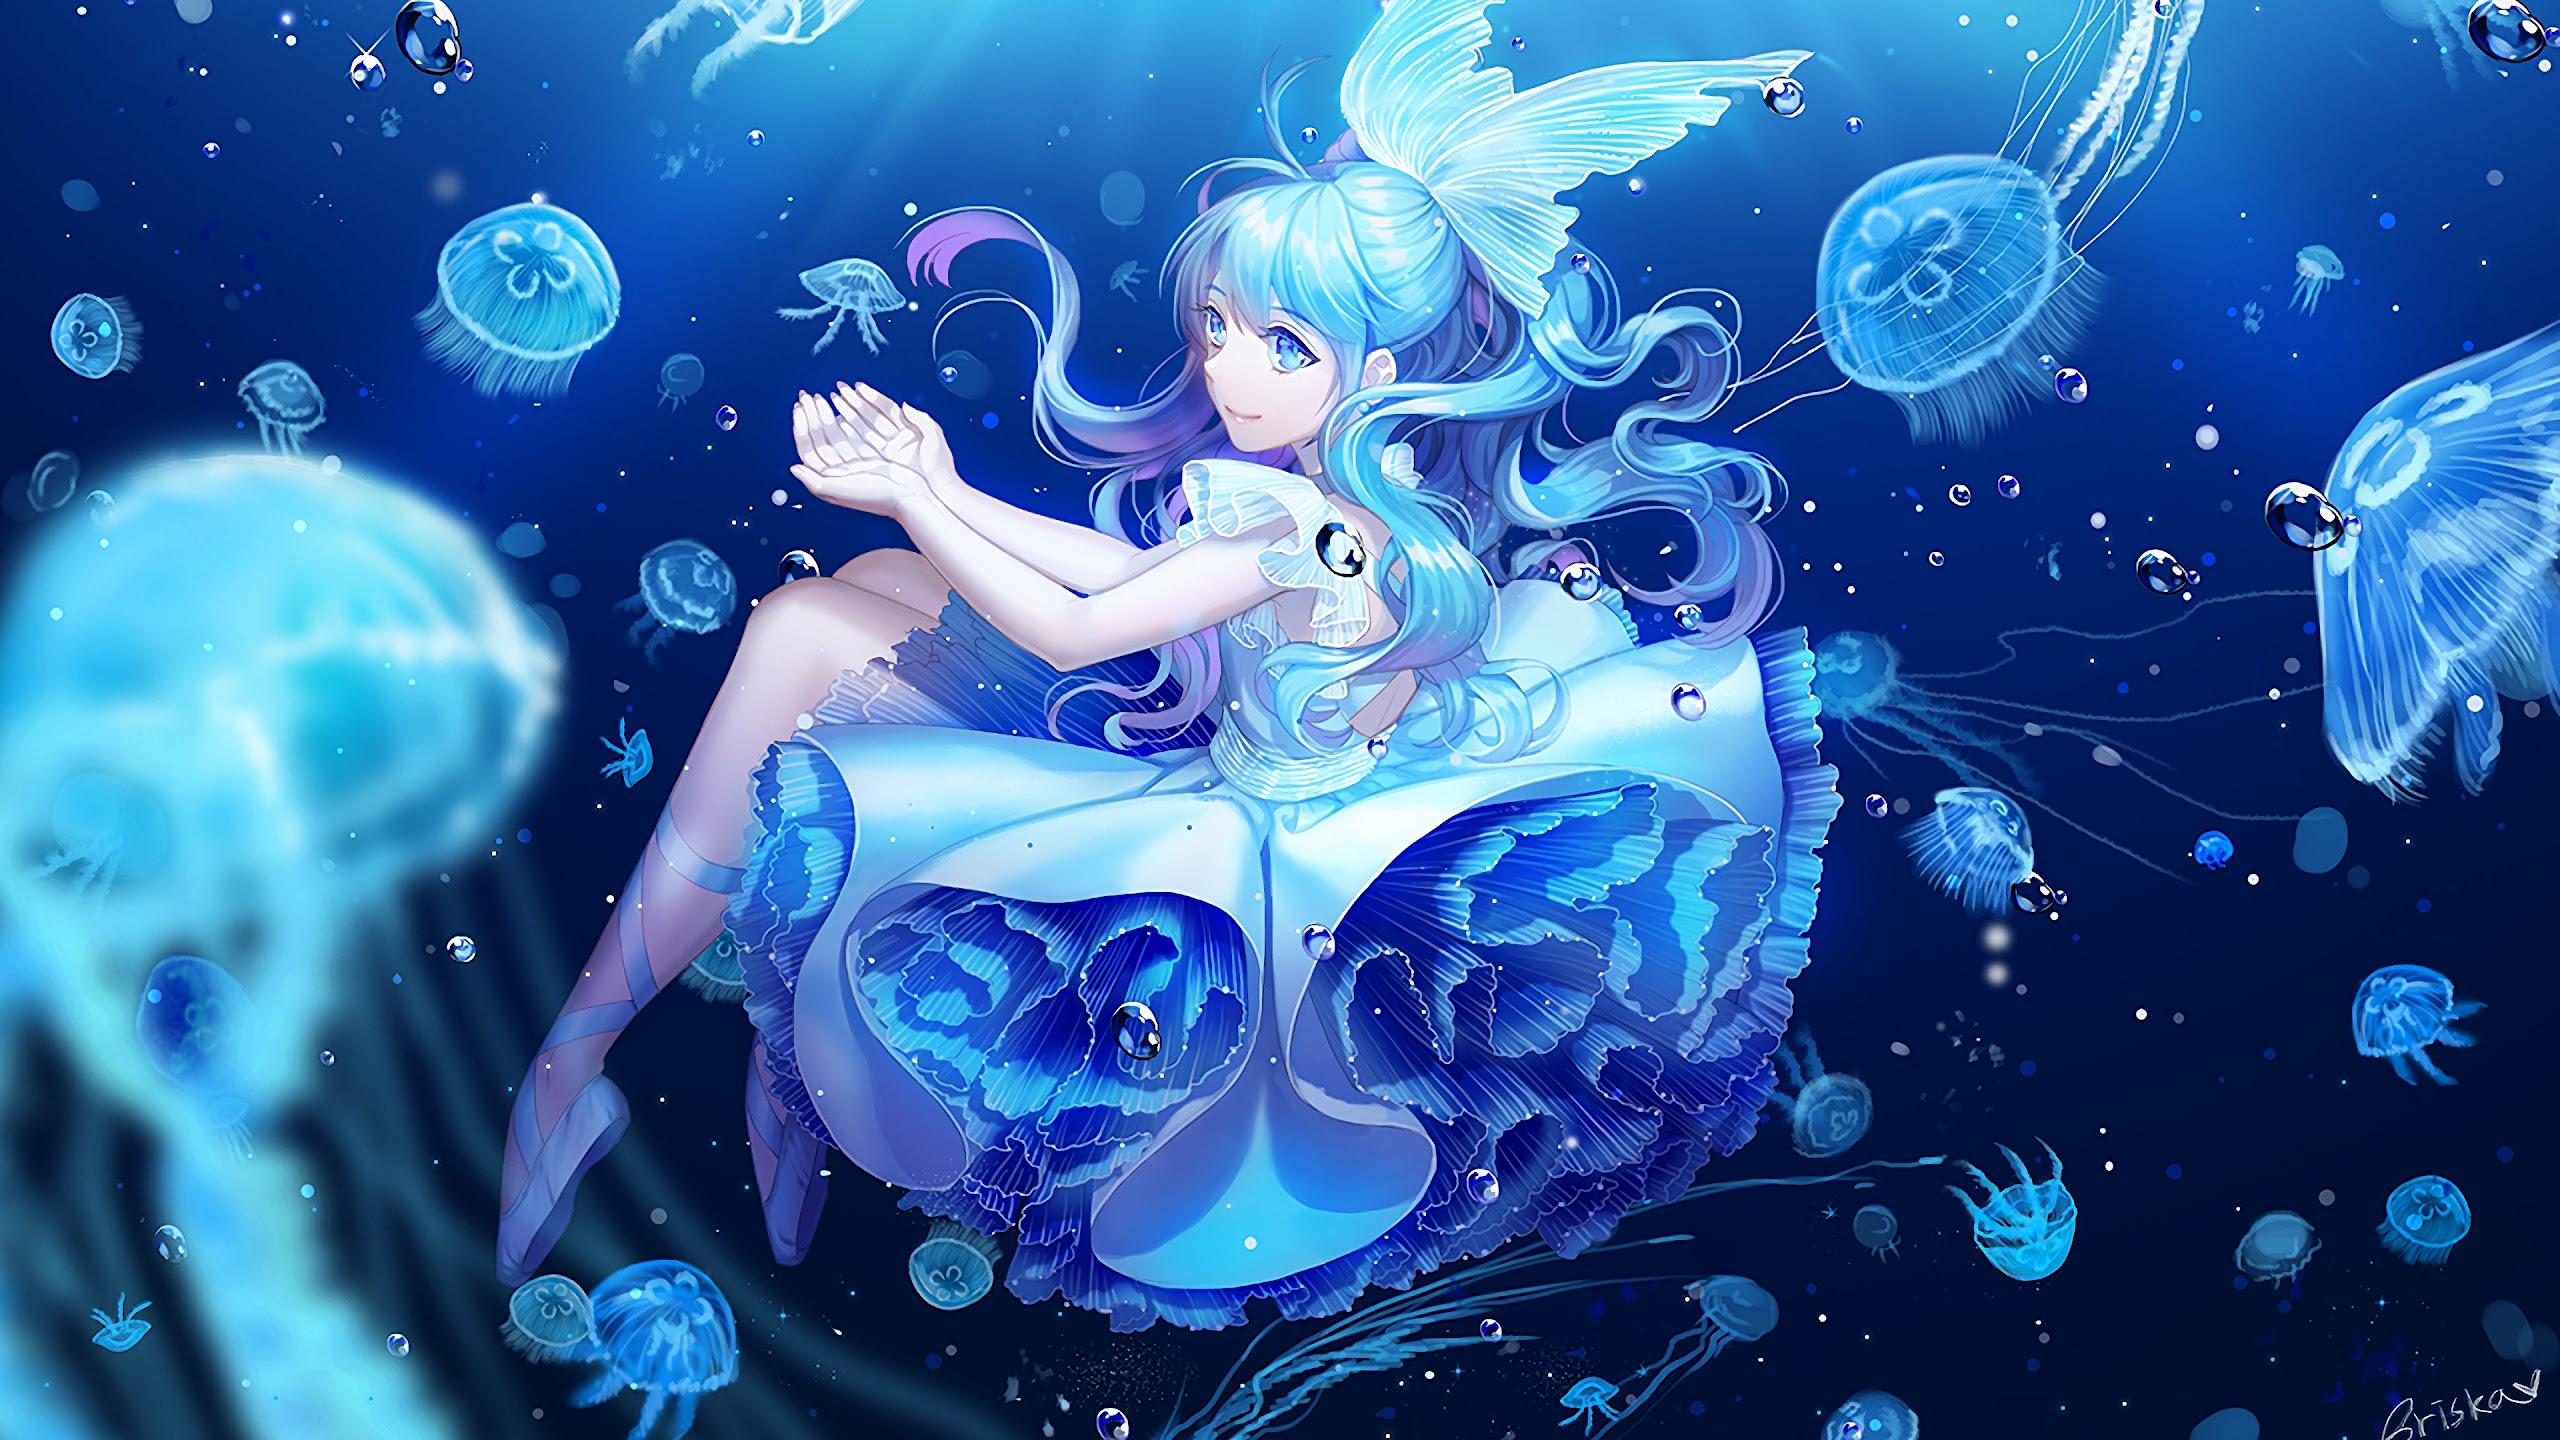 anime girl underwater uhdpaper.com 4K 115